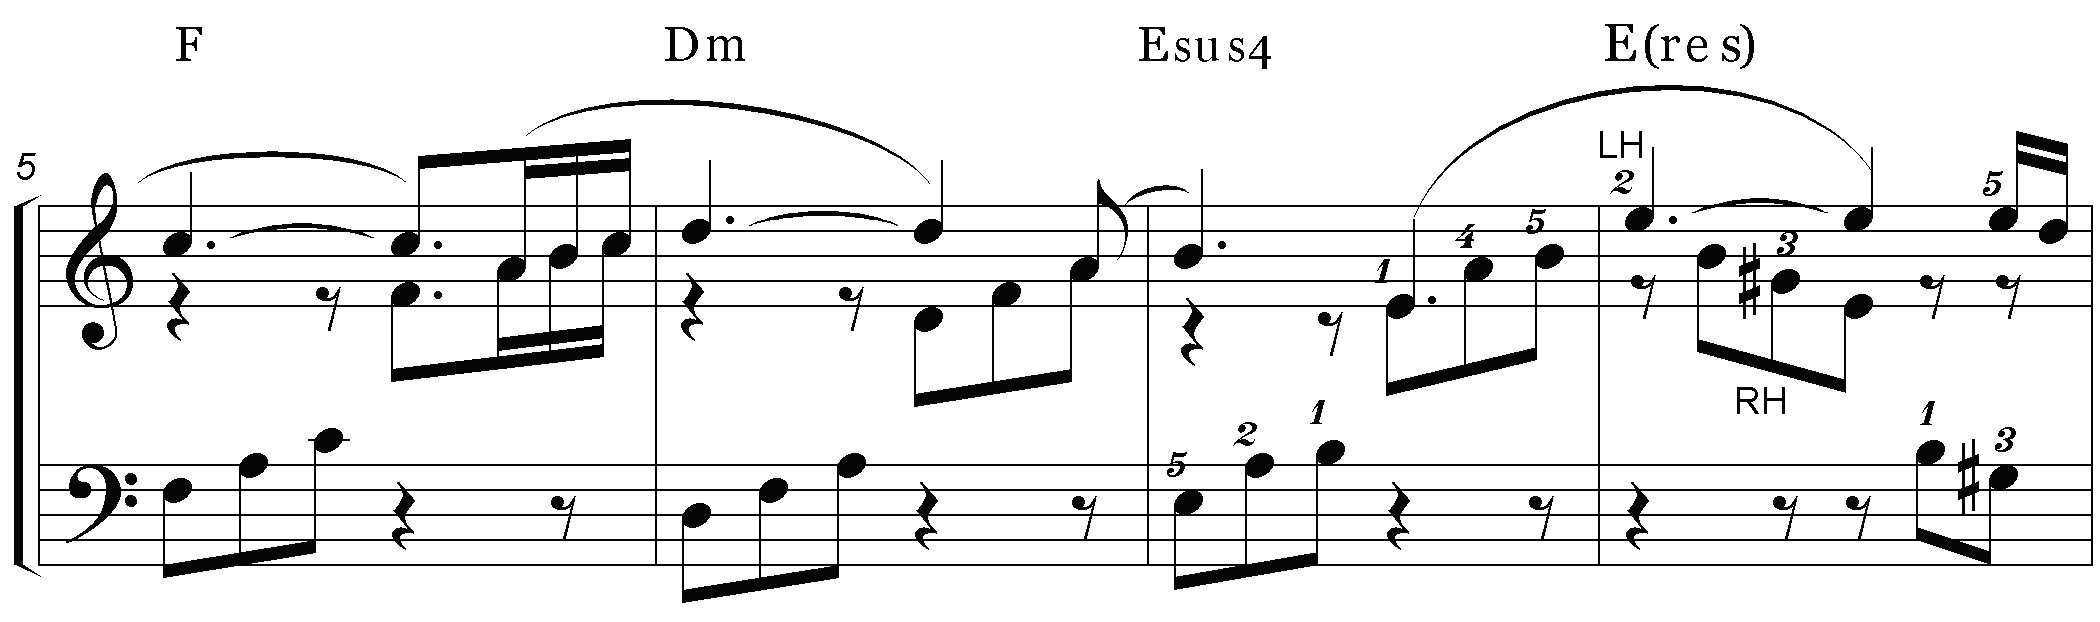 Gsus7 Sus2 Gsus G7sus Chord Piano Wwwmiifotoscom